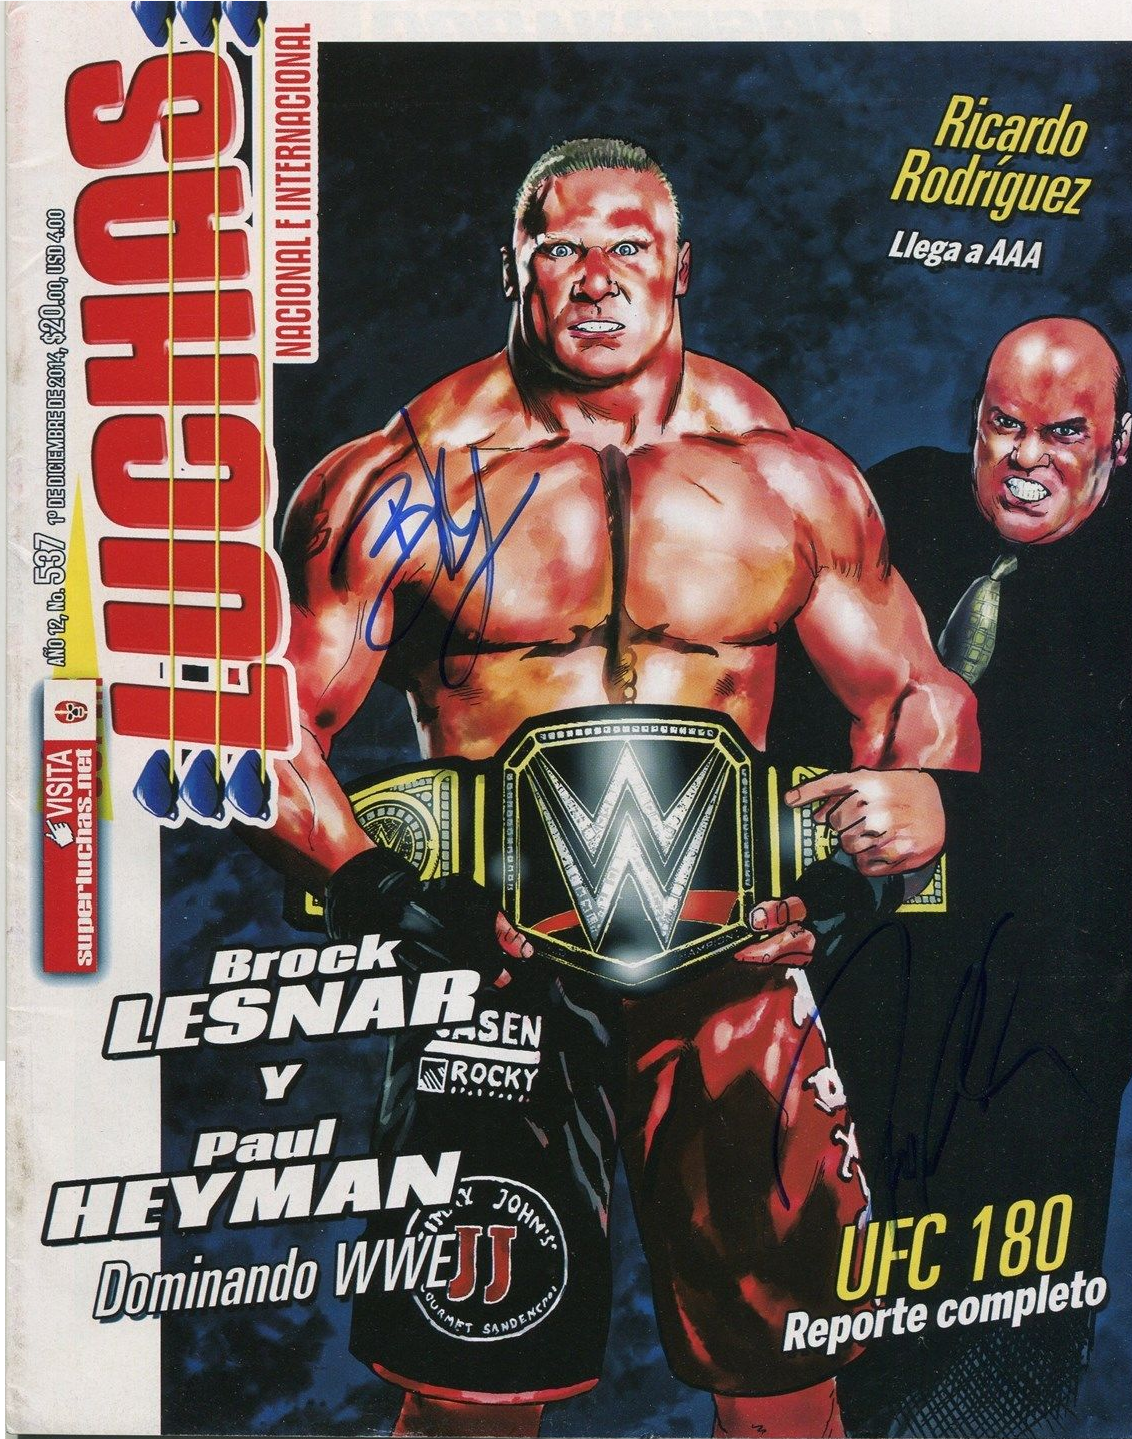 Brock Lesnar Wwe World Heavyweight Champion Rare By Nibble T Brock Lesnar Wwe Brock Lesnar Wwe